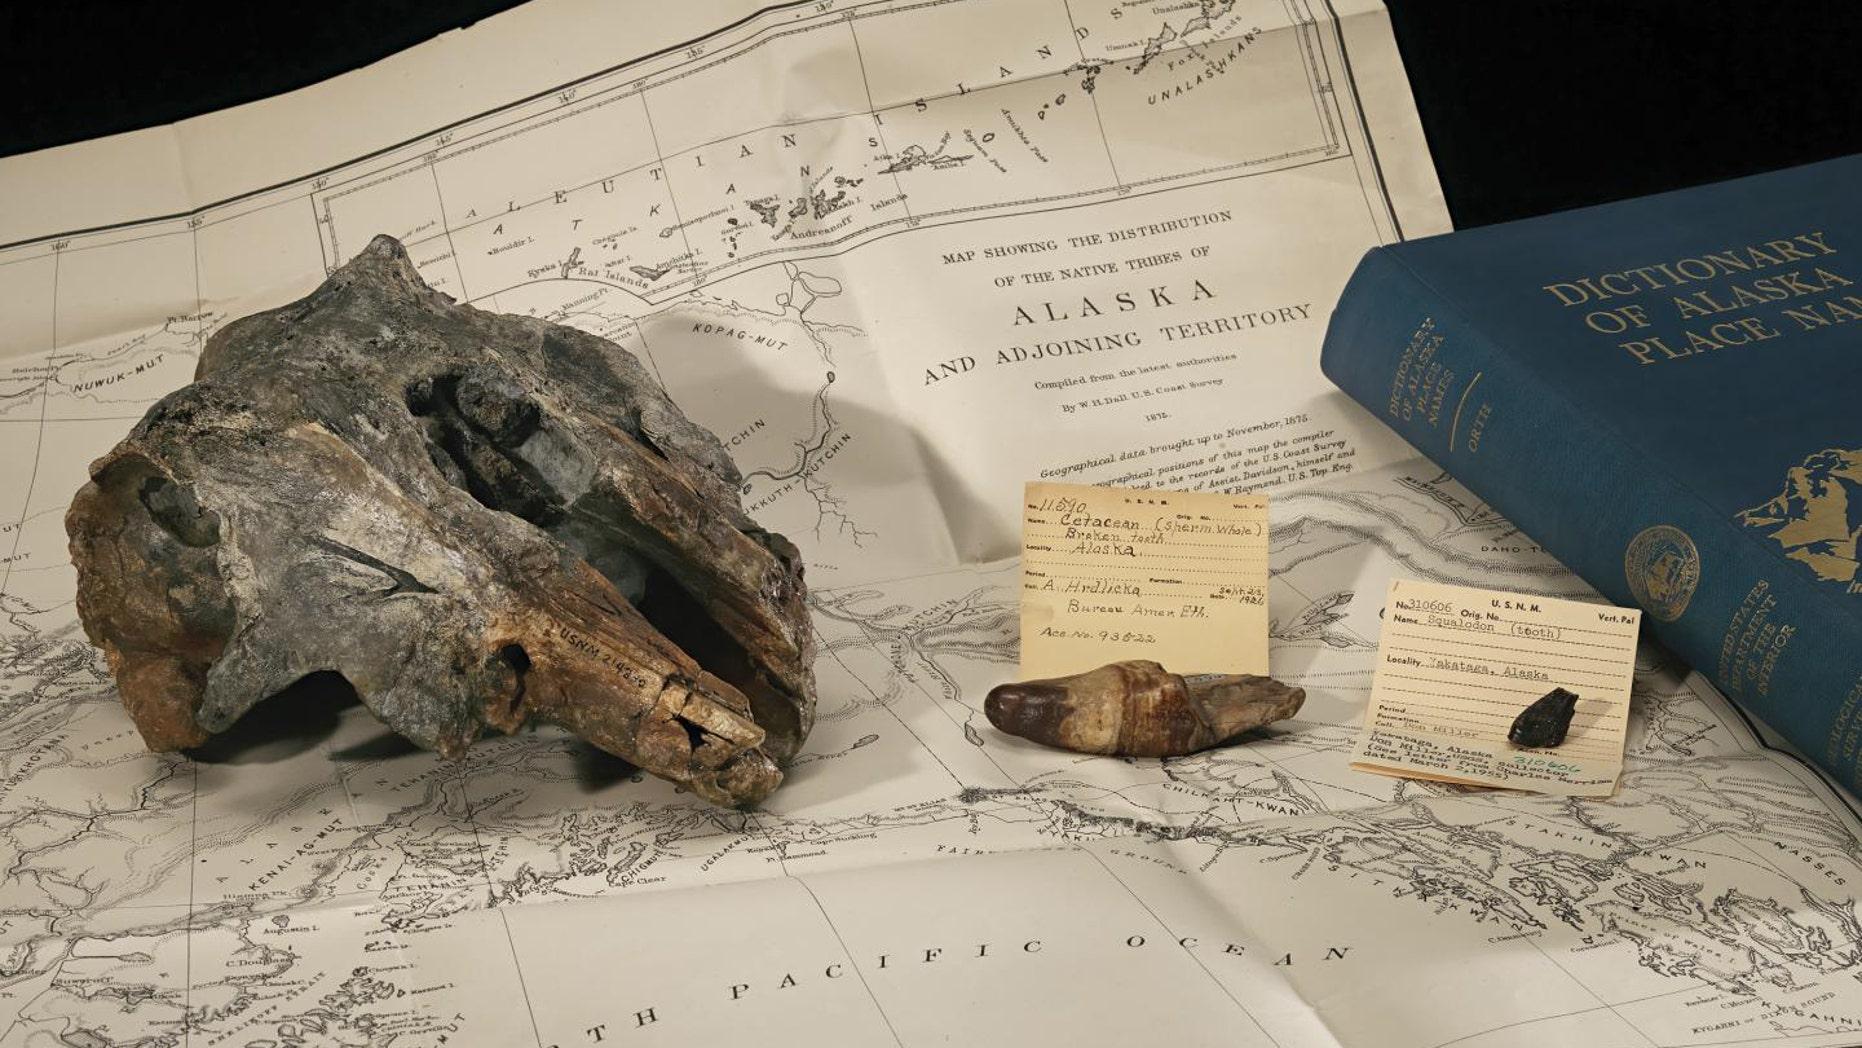 (James Di Loreto, Smithsonian)